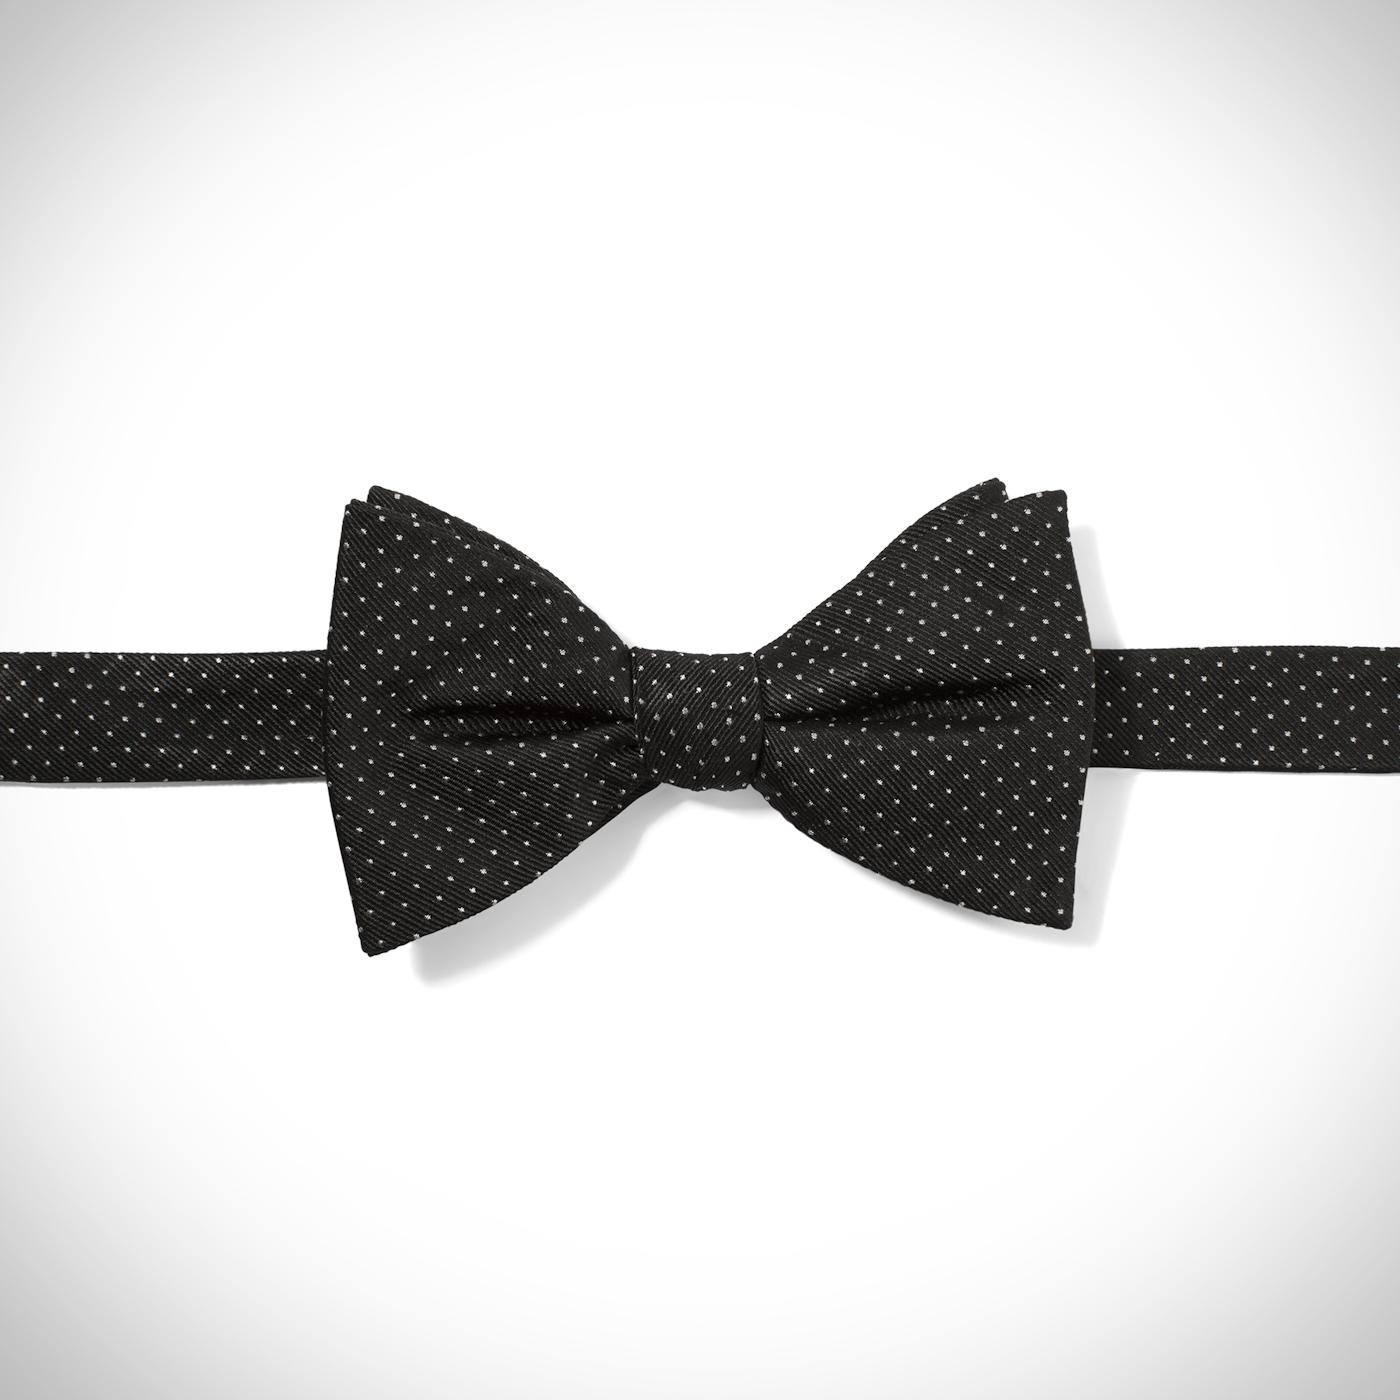 Black and White Polka Dot Pre-Tied Bow Tie